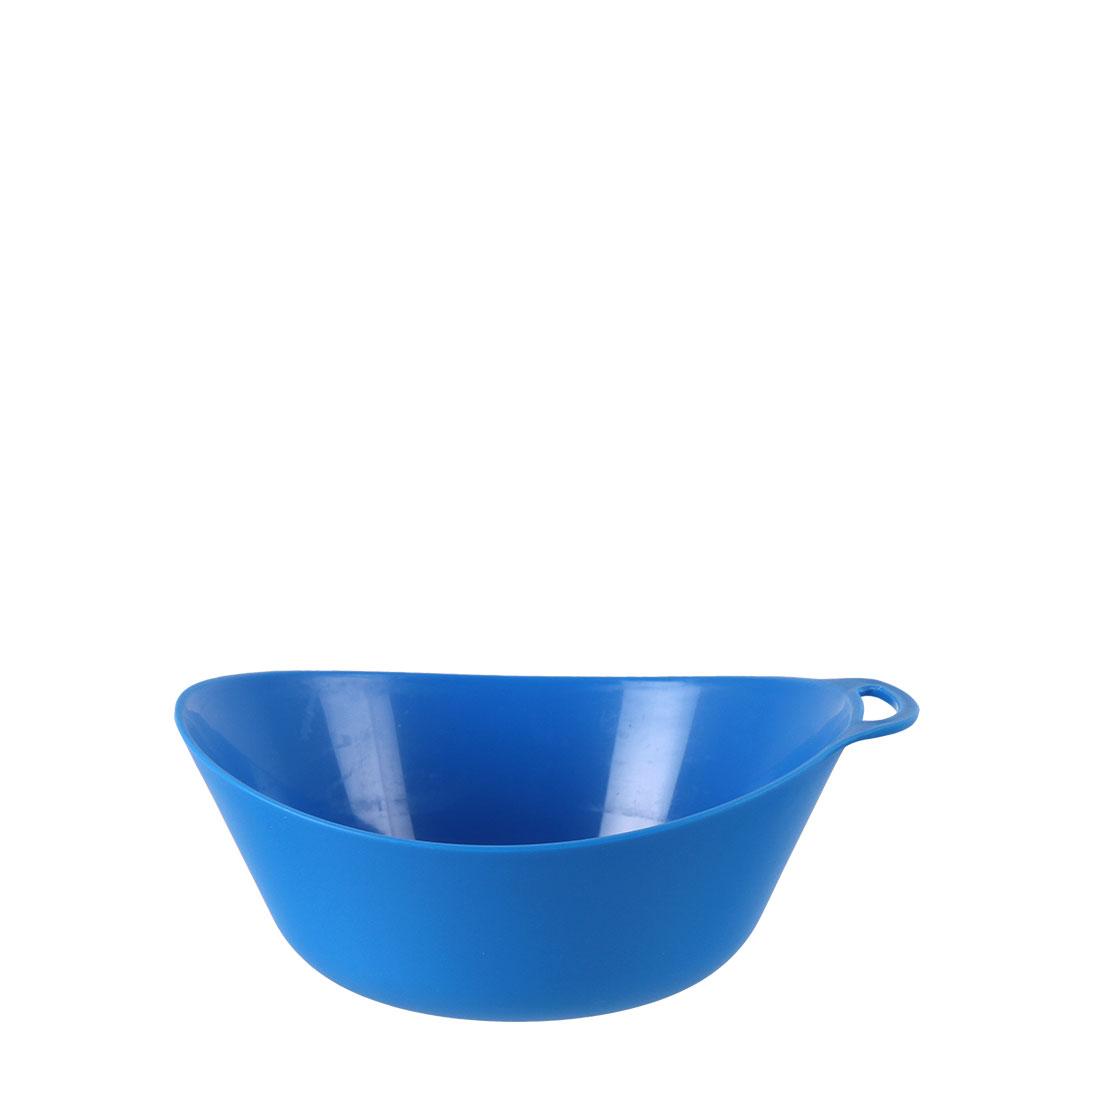 Ellipse Camping Bowl (blue)